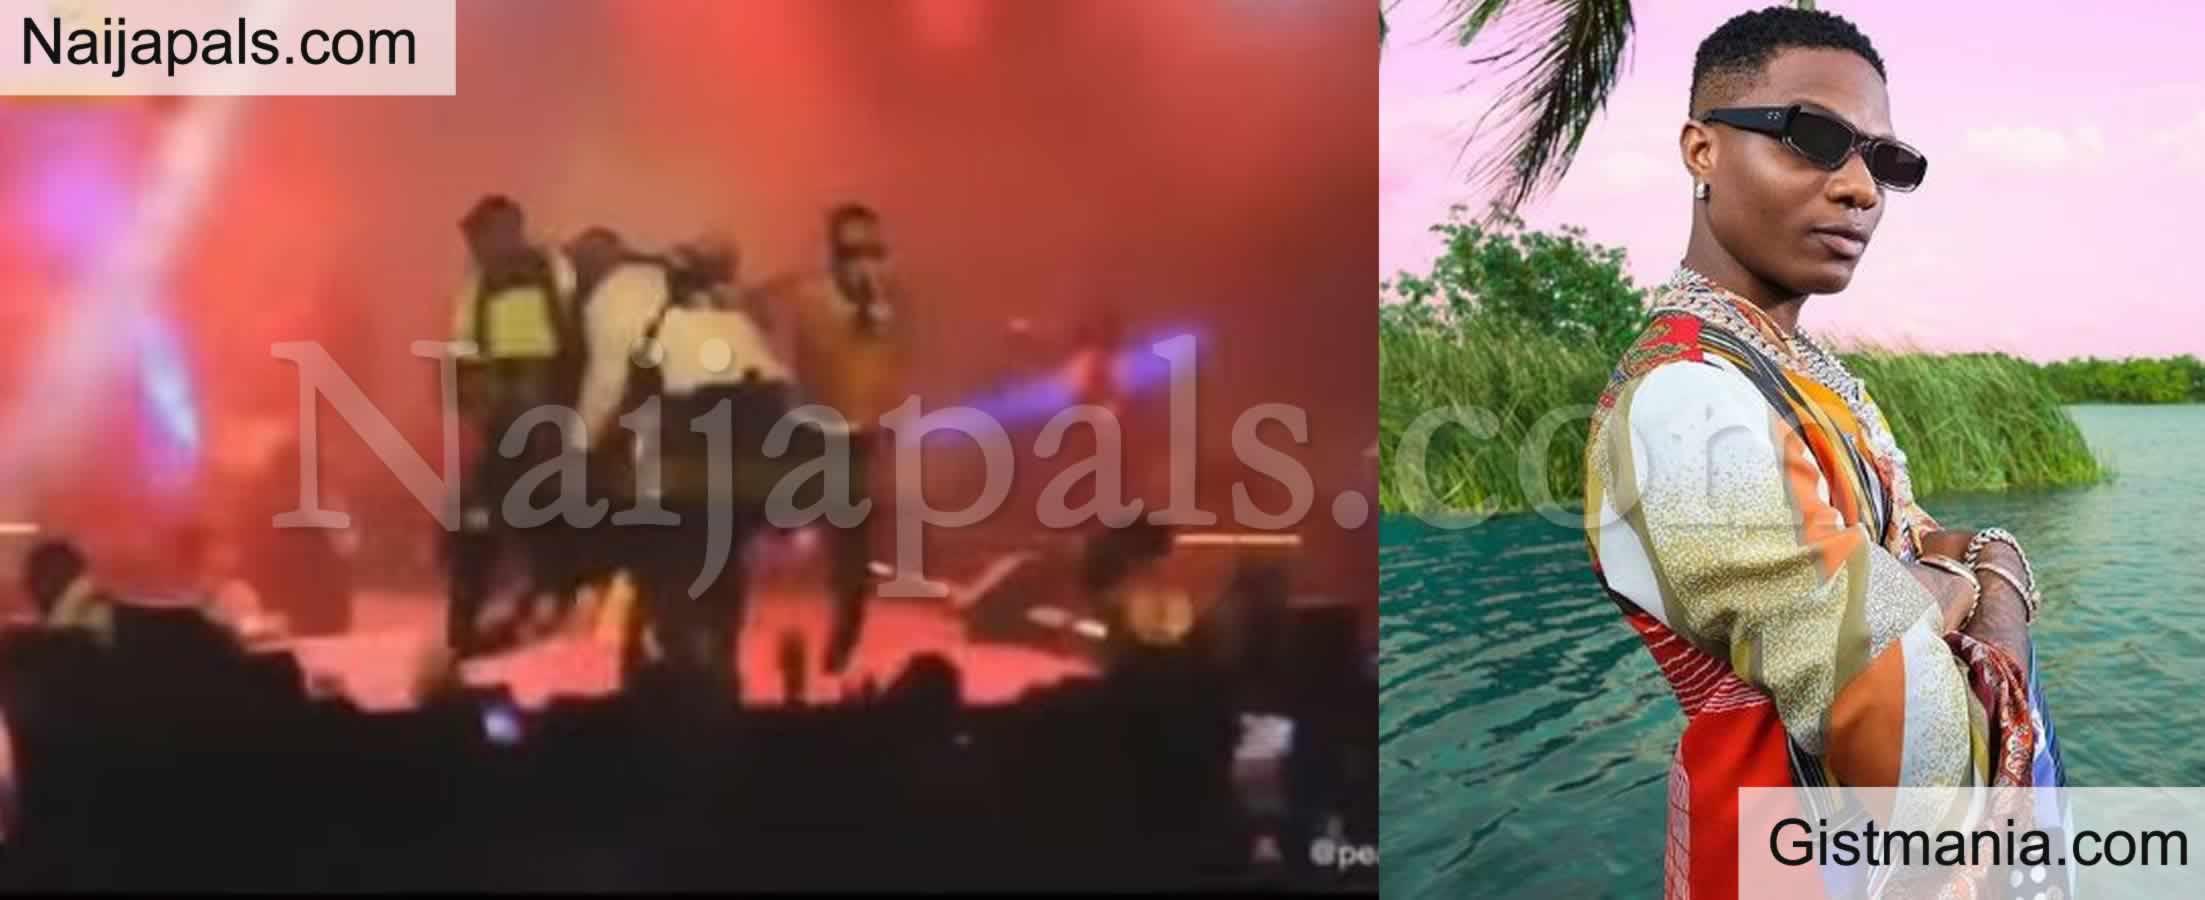 <img alt='.' class='lazyload' data-src='https://img.gistmania.com/emot/thumbs_up.gif' /><img alt='.' class='lazyload' data-src='https://img.gistmania.com/emot/video.gif' /> STARBOY!<b> Nigerian Singer, Wizkid Gets A Customized Private Jet Floormat</b> (Video)